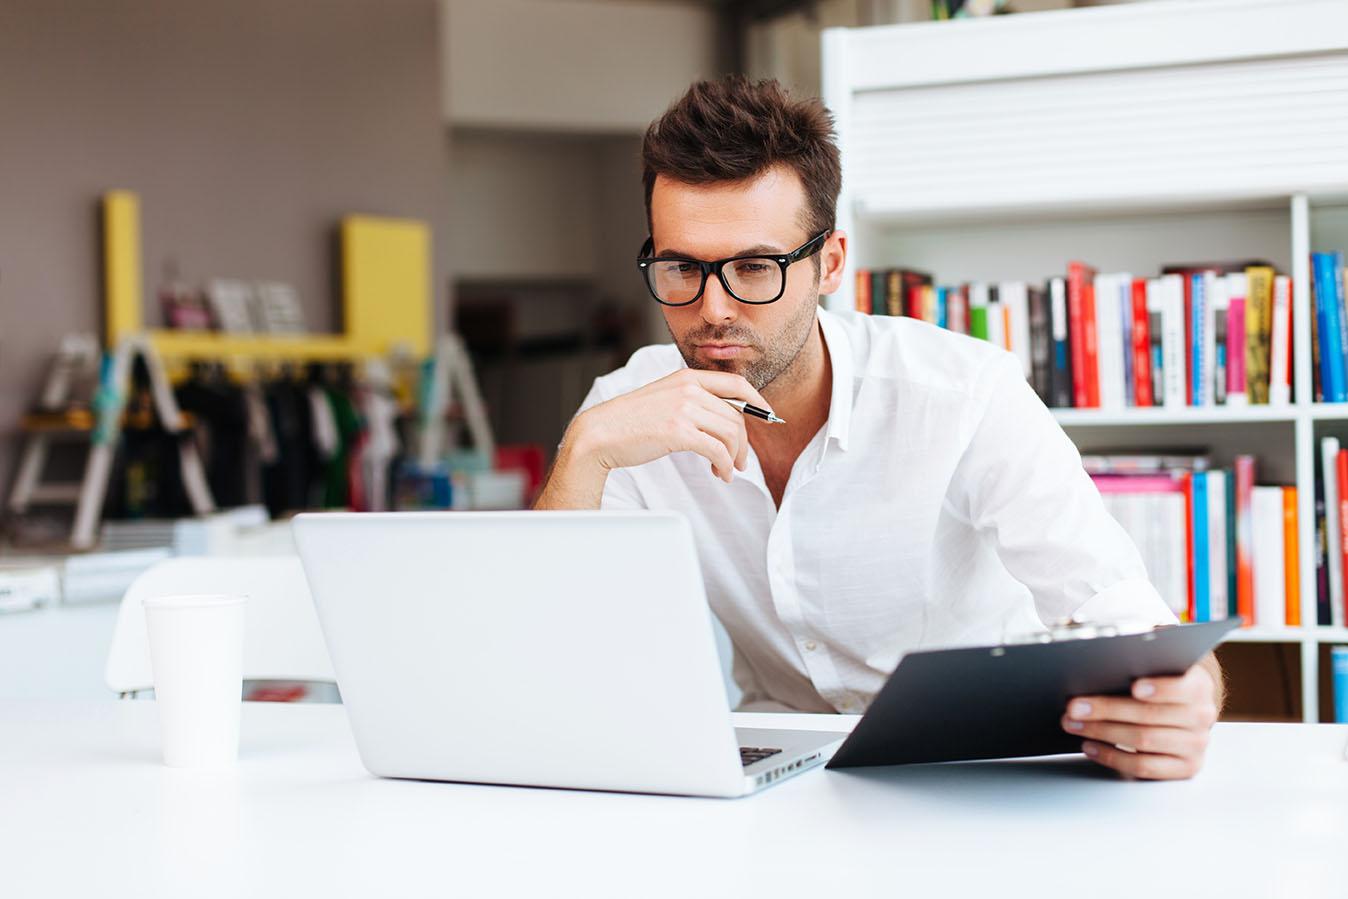 Computer Protection Eyeglasses